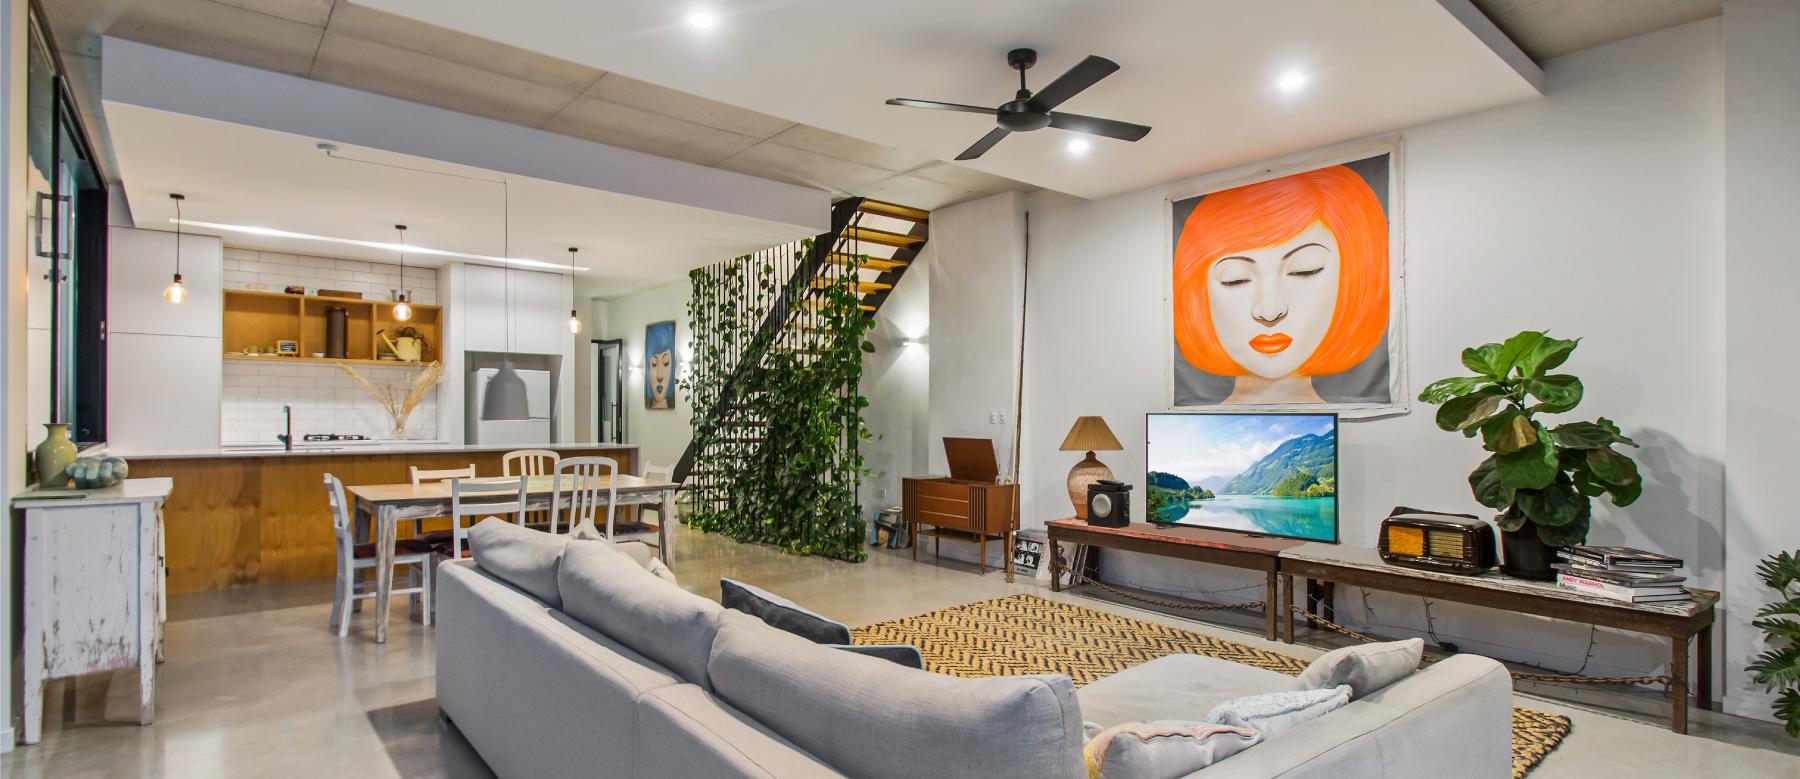 Grant McDonald Homes Coolum House interior